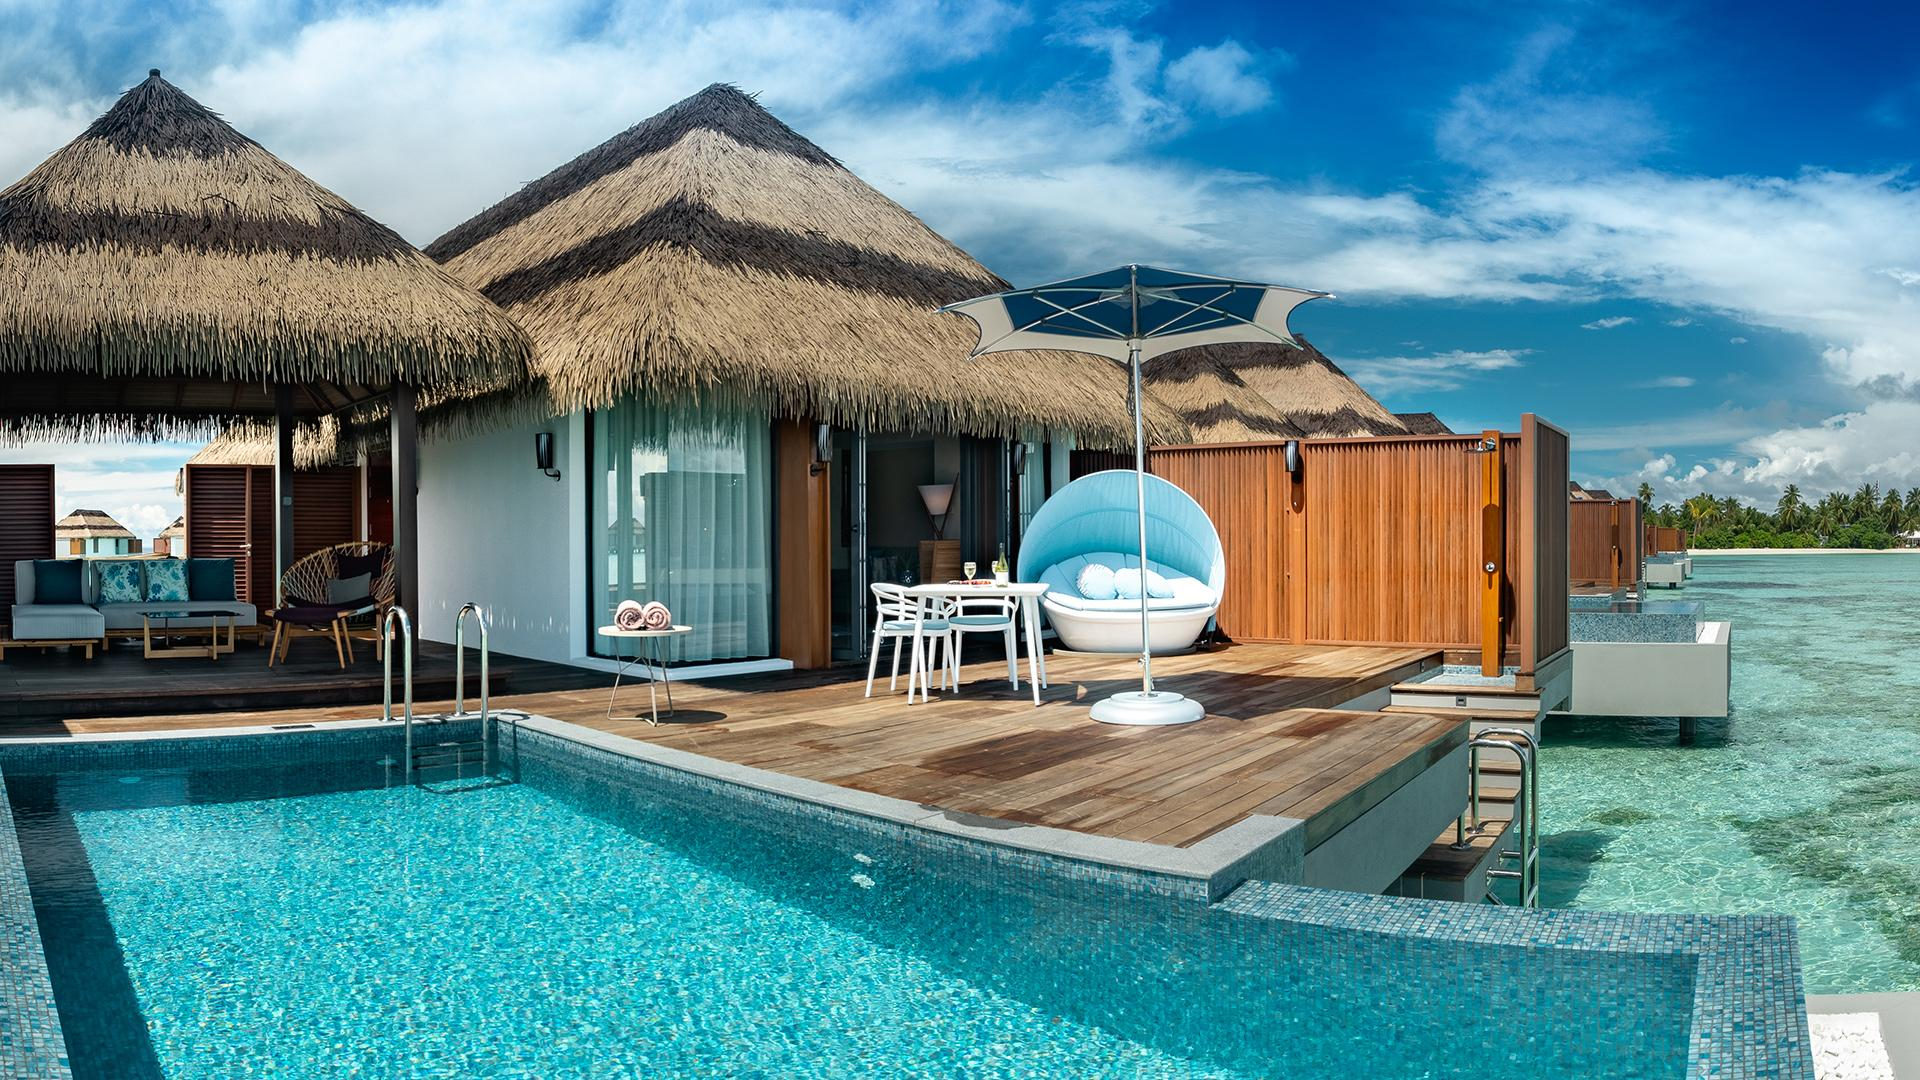 Ocean Pool Villa image 1 at Pullman Maldives Maamutaa Resort by null, Upper South Province, Maldives